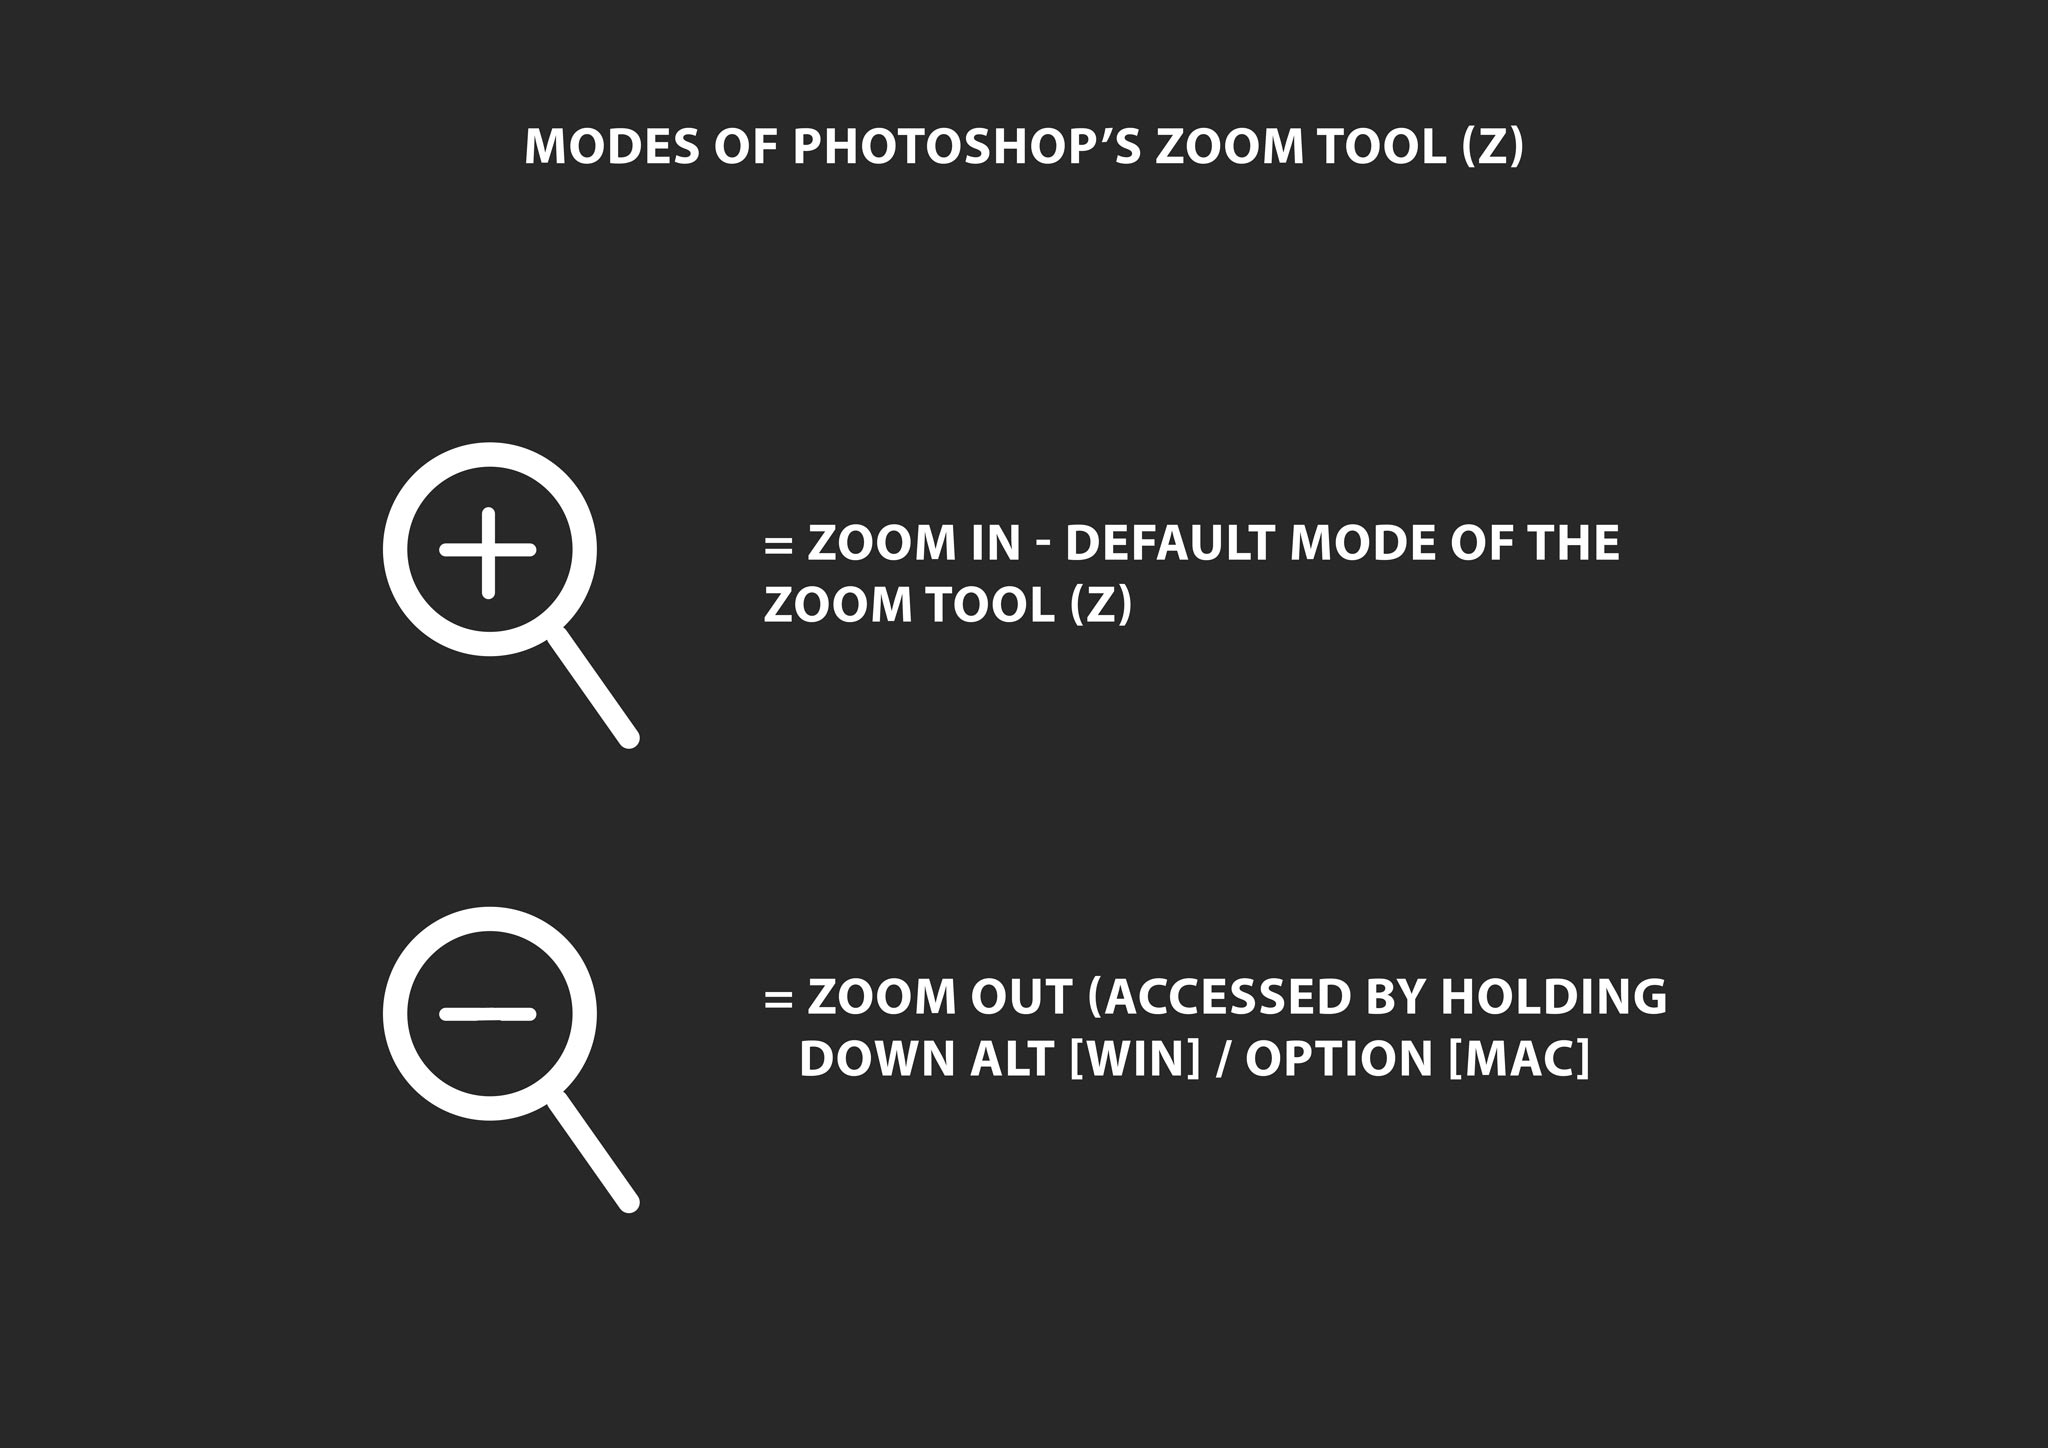 zoom tool explain photoshop